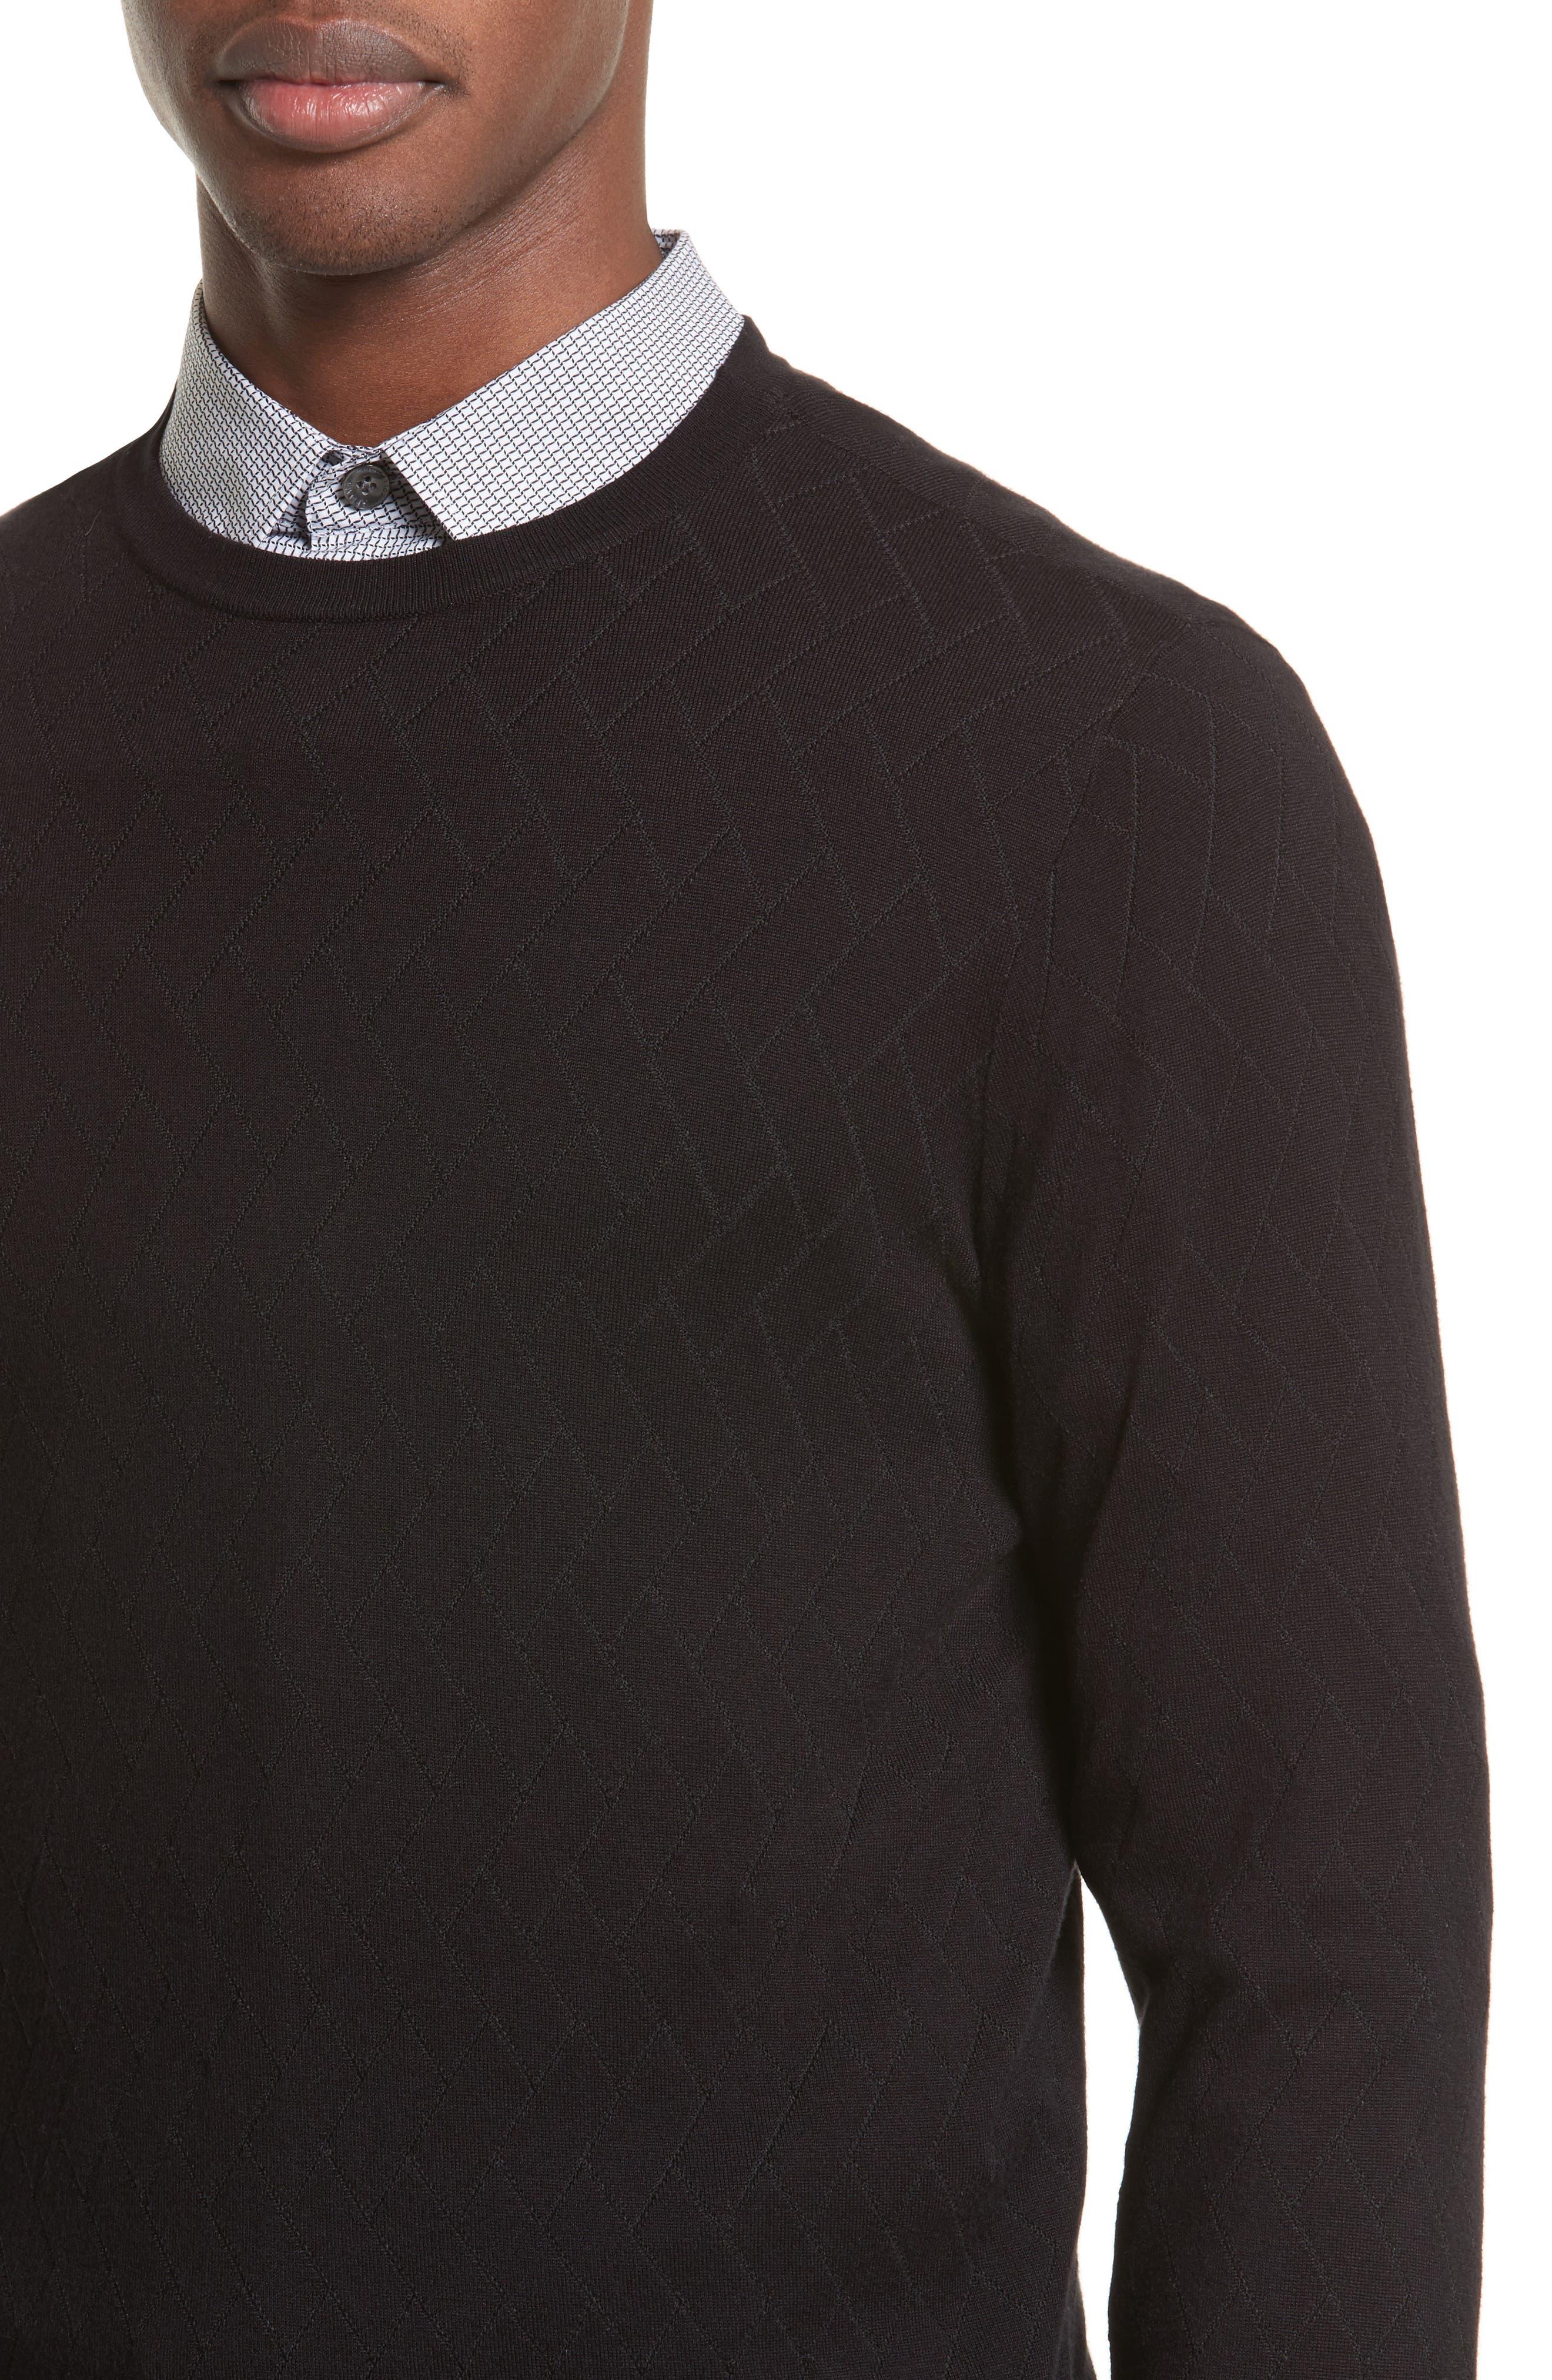 Plated Crewneck Sweater,                             Alternate thumbnail 4, color,                             Black